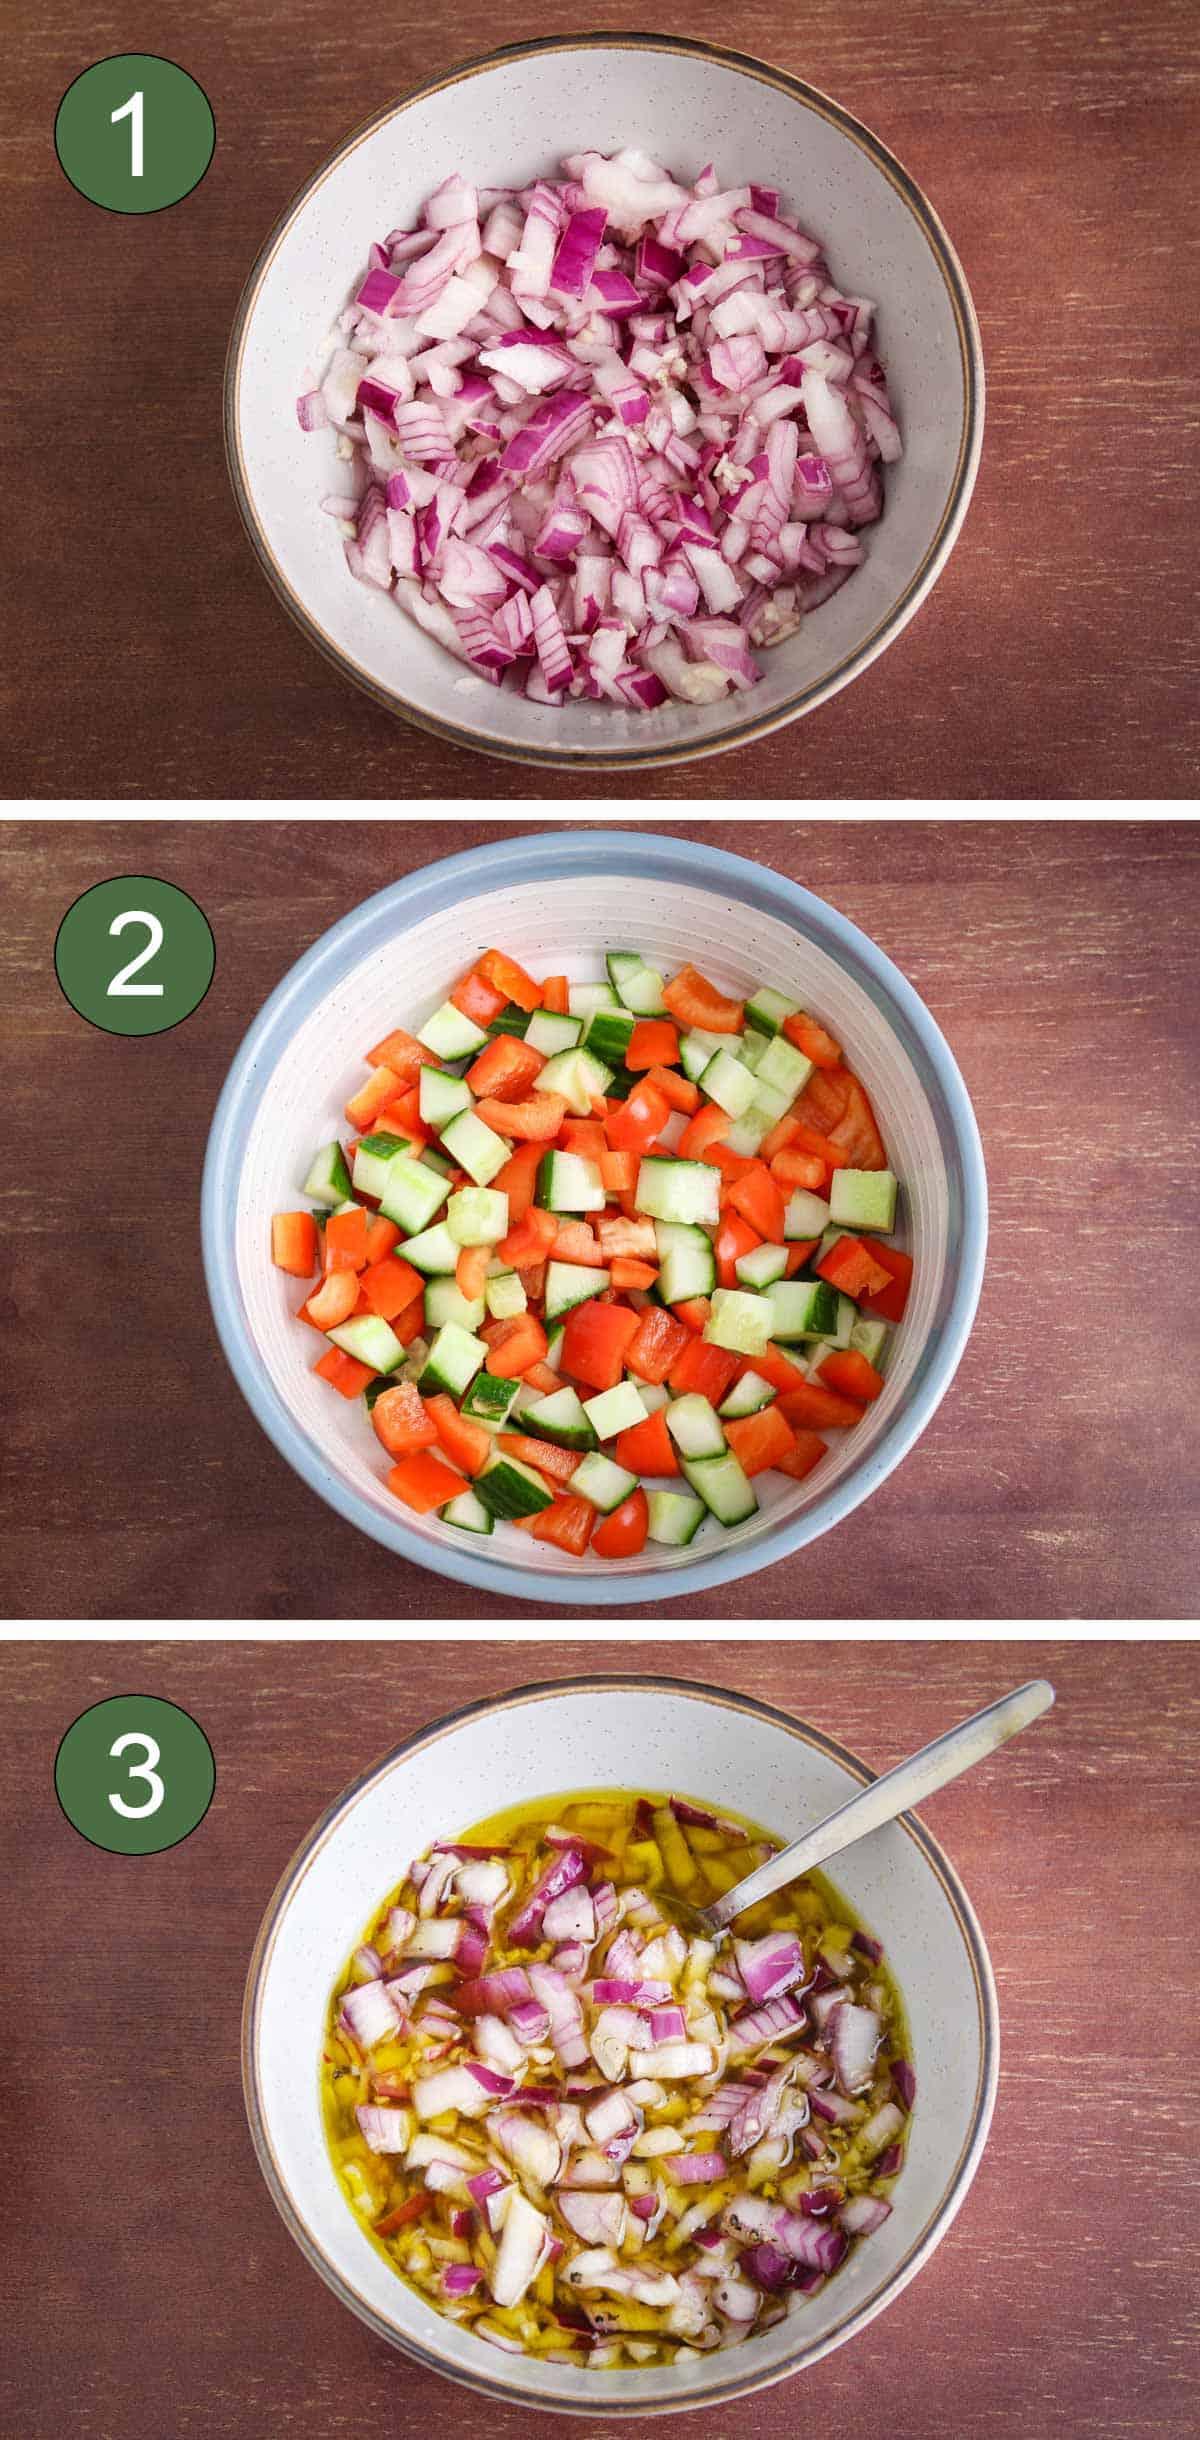 Steps Showing How to Make Vegan Bean Salad